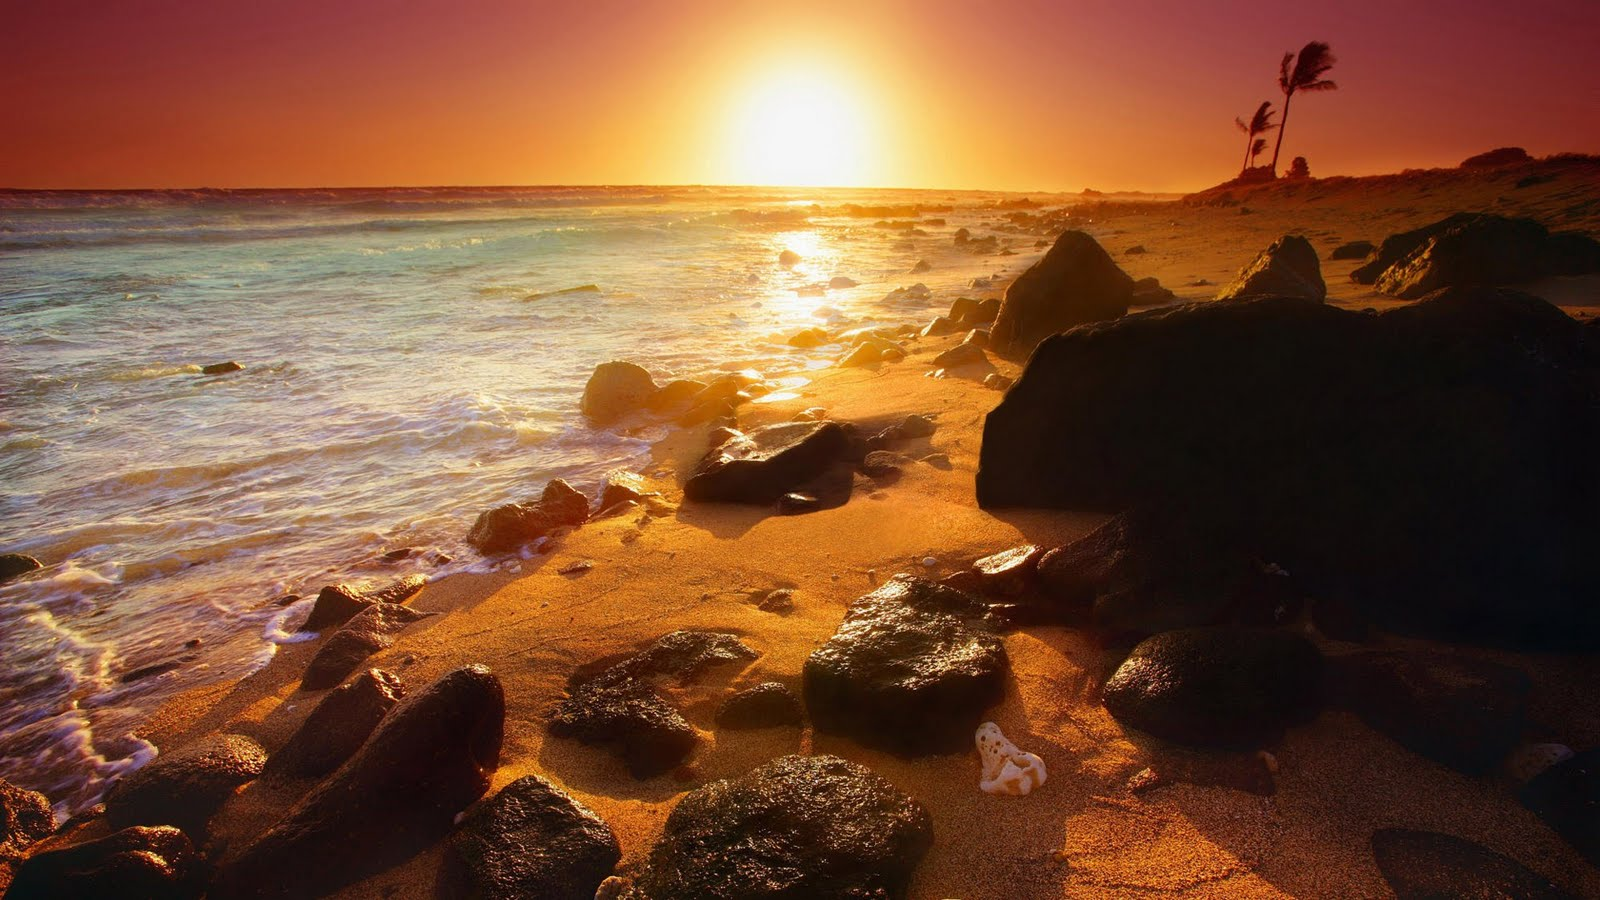 http://2.bp.blogspot.com/-9Qd_PYk9ZIY/TjEAKu08XQI/AAAAAAAABcA/1HCrdDnCuHc/s1600/HD_beautiful_nature_landsacpe_1920RCRL_8001.jpg